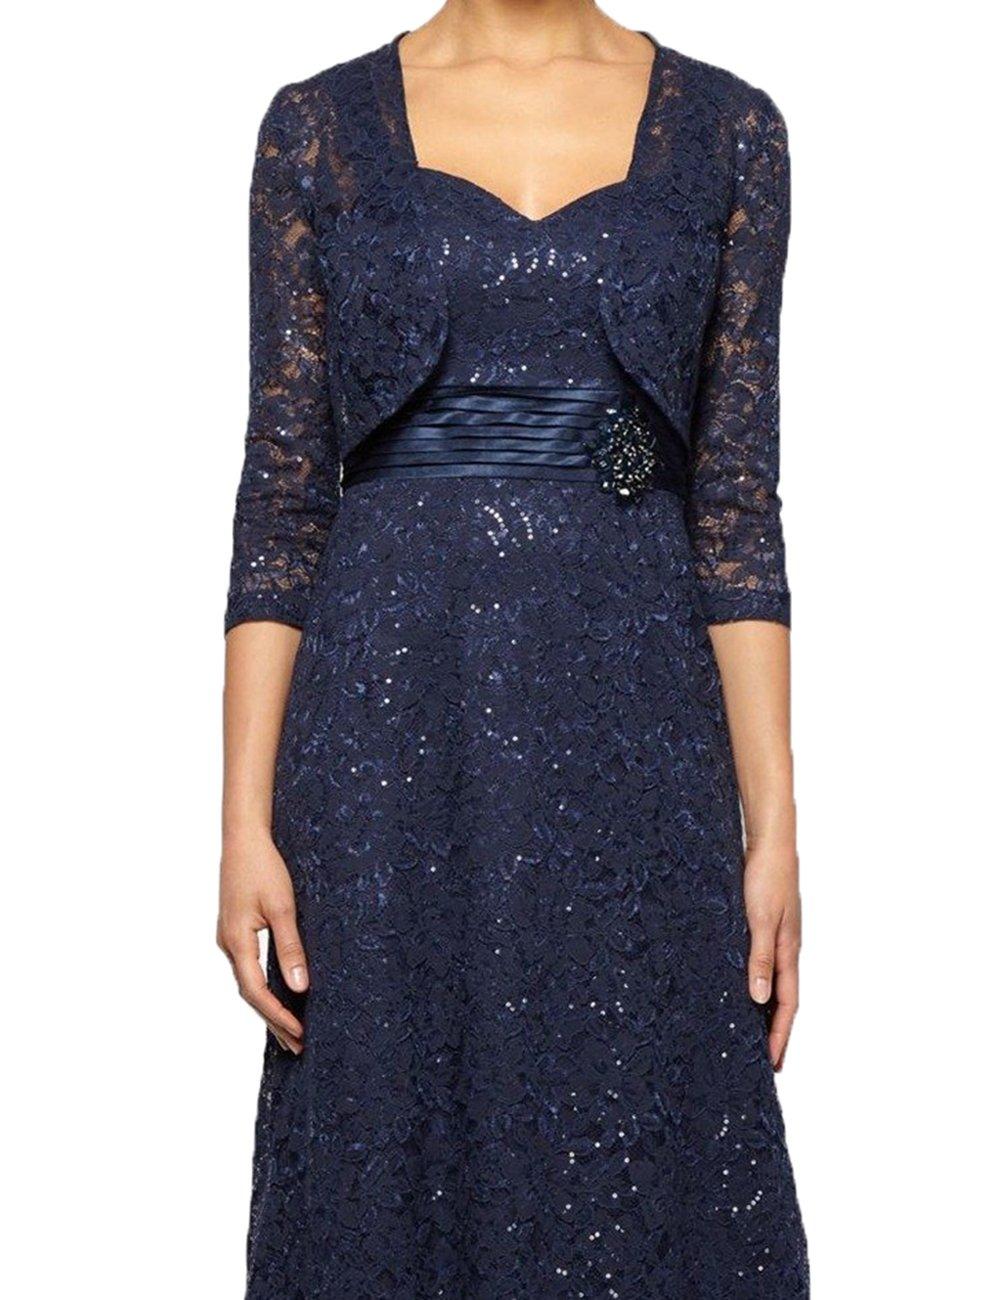 HIDRESS Women's Long Sleeves Wedding Shrugs Floral Lace Open Front Bolero Jackets Shawl BQ127Size 8 Navy